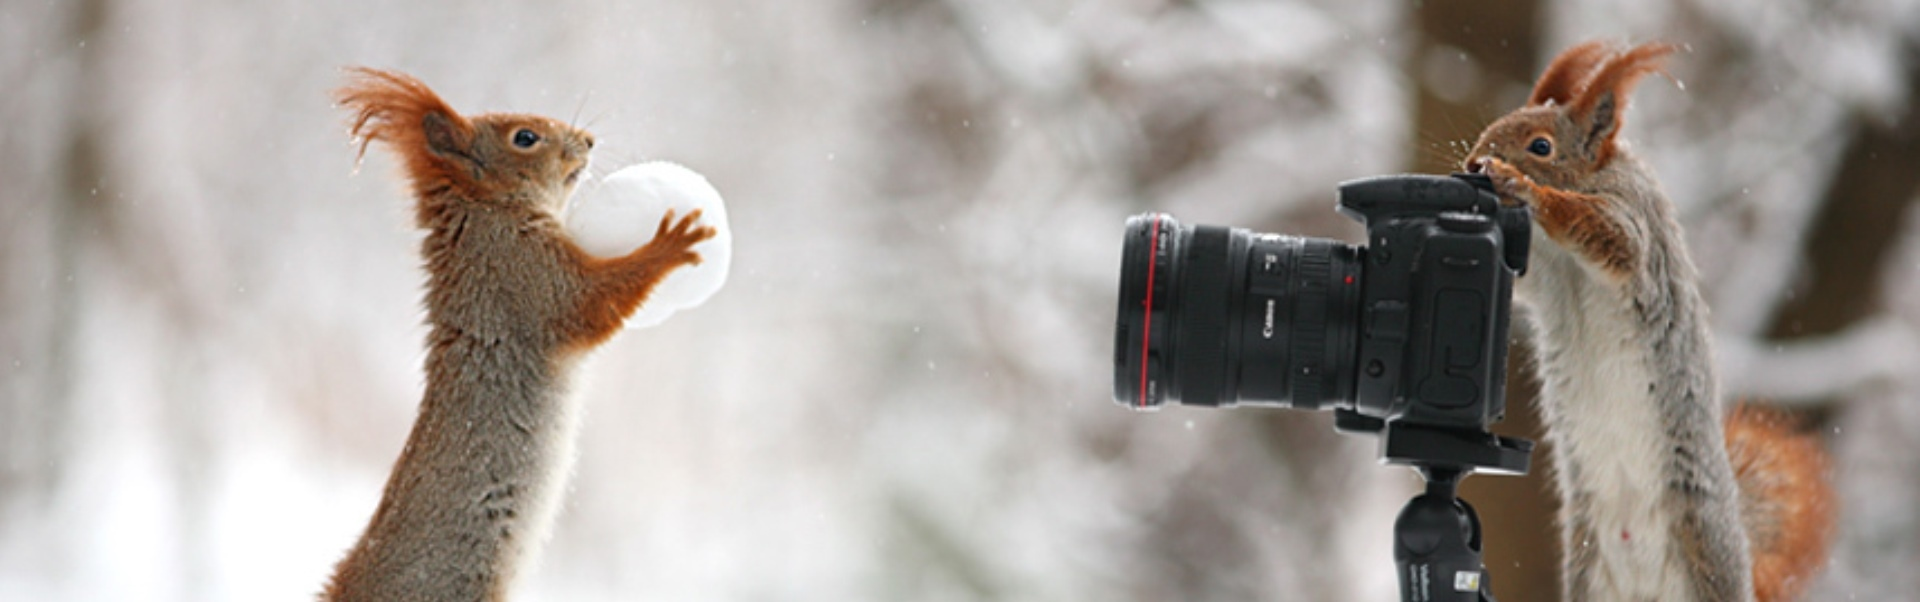 11 animale care se pricep la fotografie mai bine decât tine